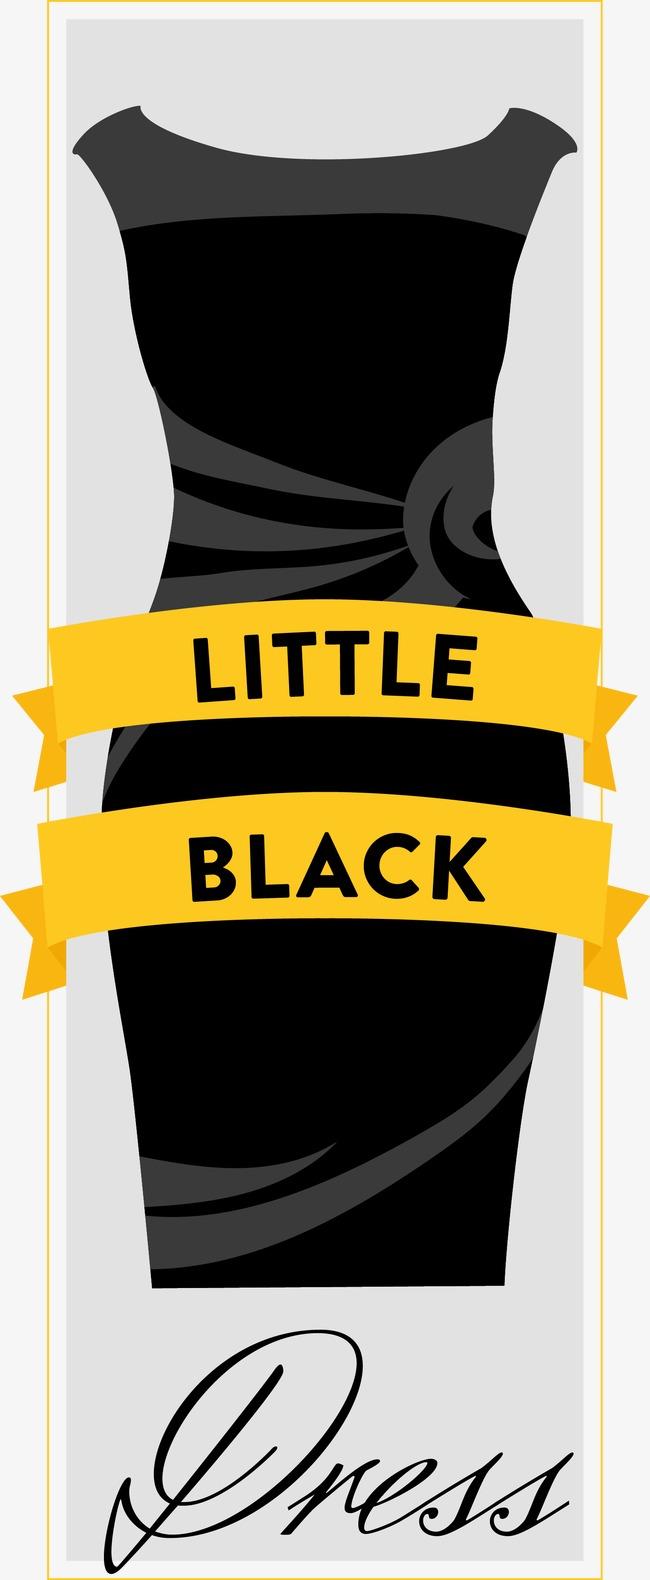 650x1580 Vector Little Black Card, Little Black Dress, Black, Card Png And